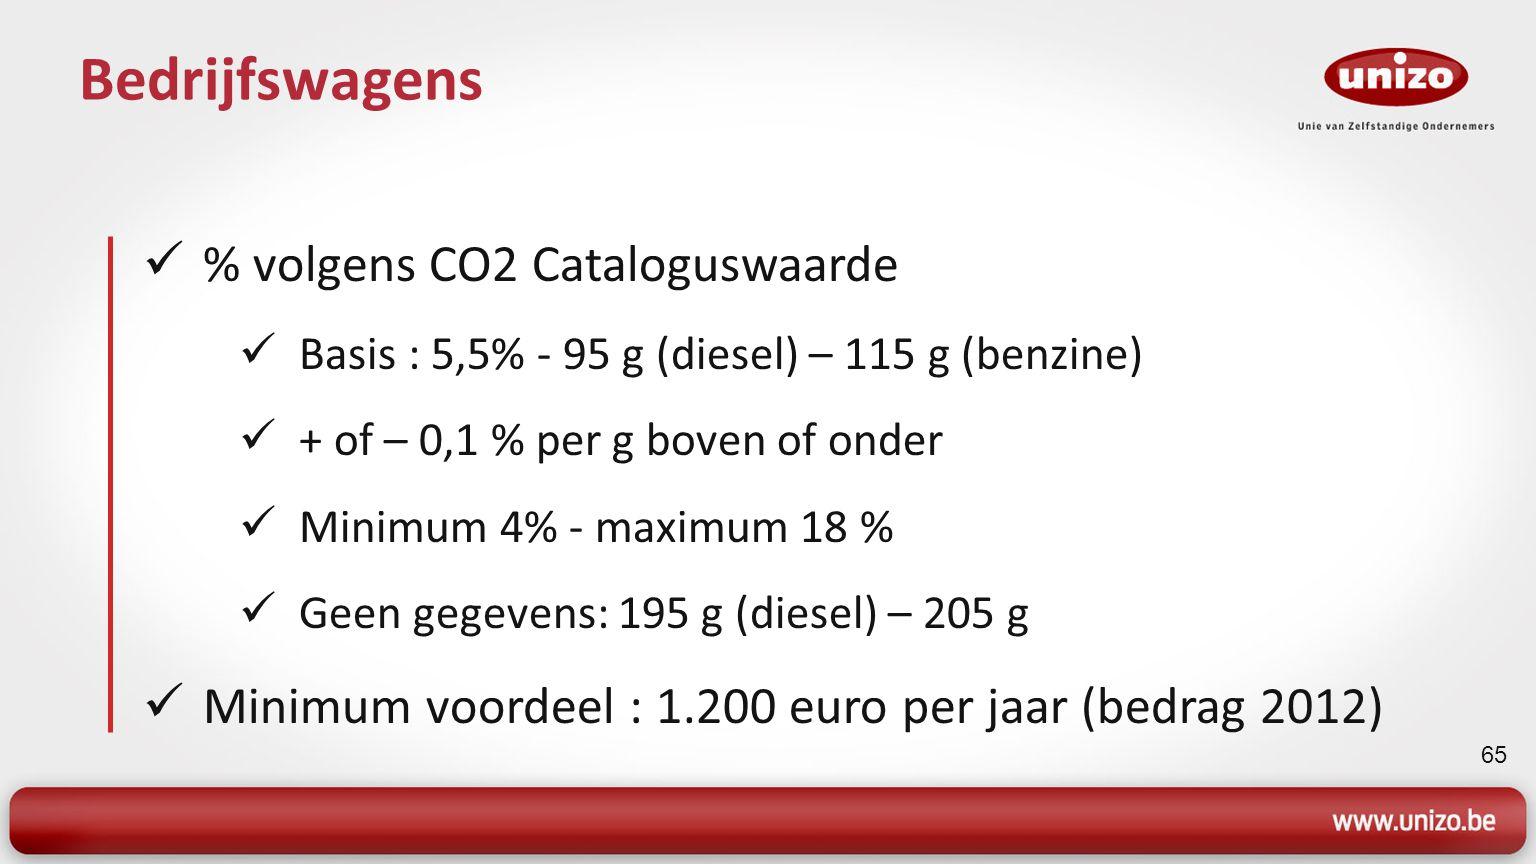 65 Bedrijfswagens % volgens CO2 Cataloguswaarde Basis : 5,5% - 95 g (diesel) – 115 g (benzine) + of – 0,1 % per g boven of onder Minimum 4% - maximum 18 % Geen gegevens: 195 g (diesel) – 205 g Minimum voordeel : 1.200 euro per jaar (bedrag 2012)